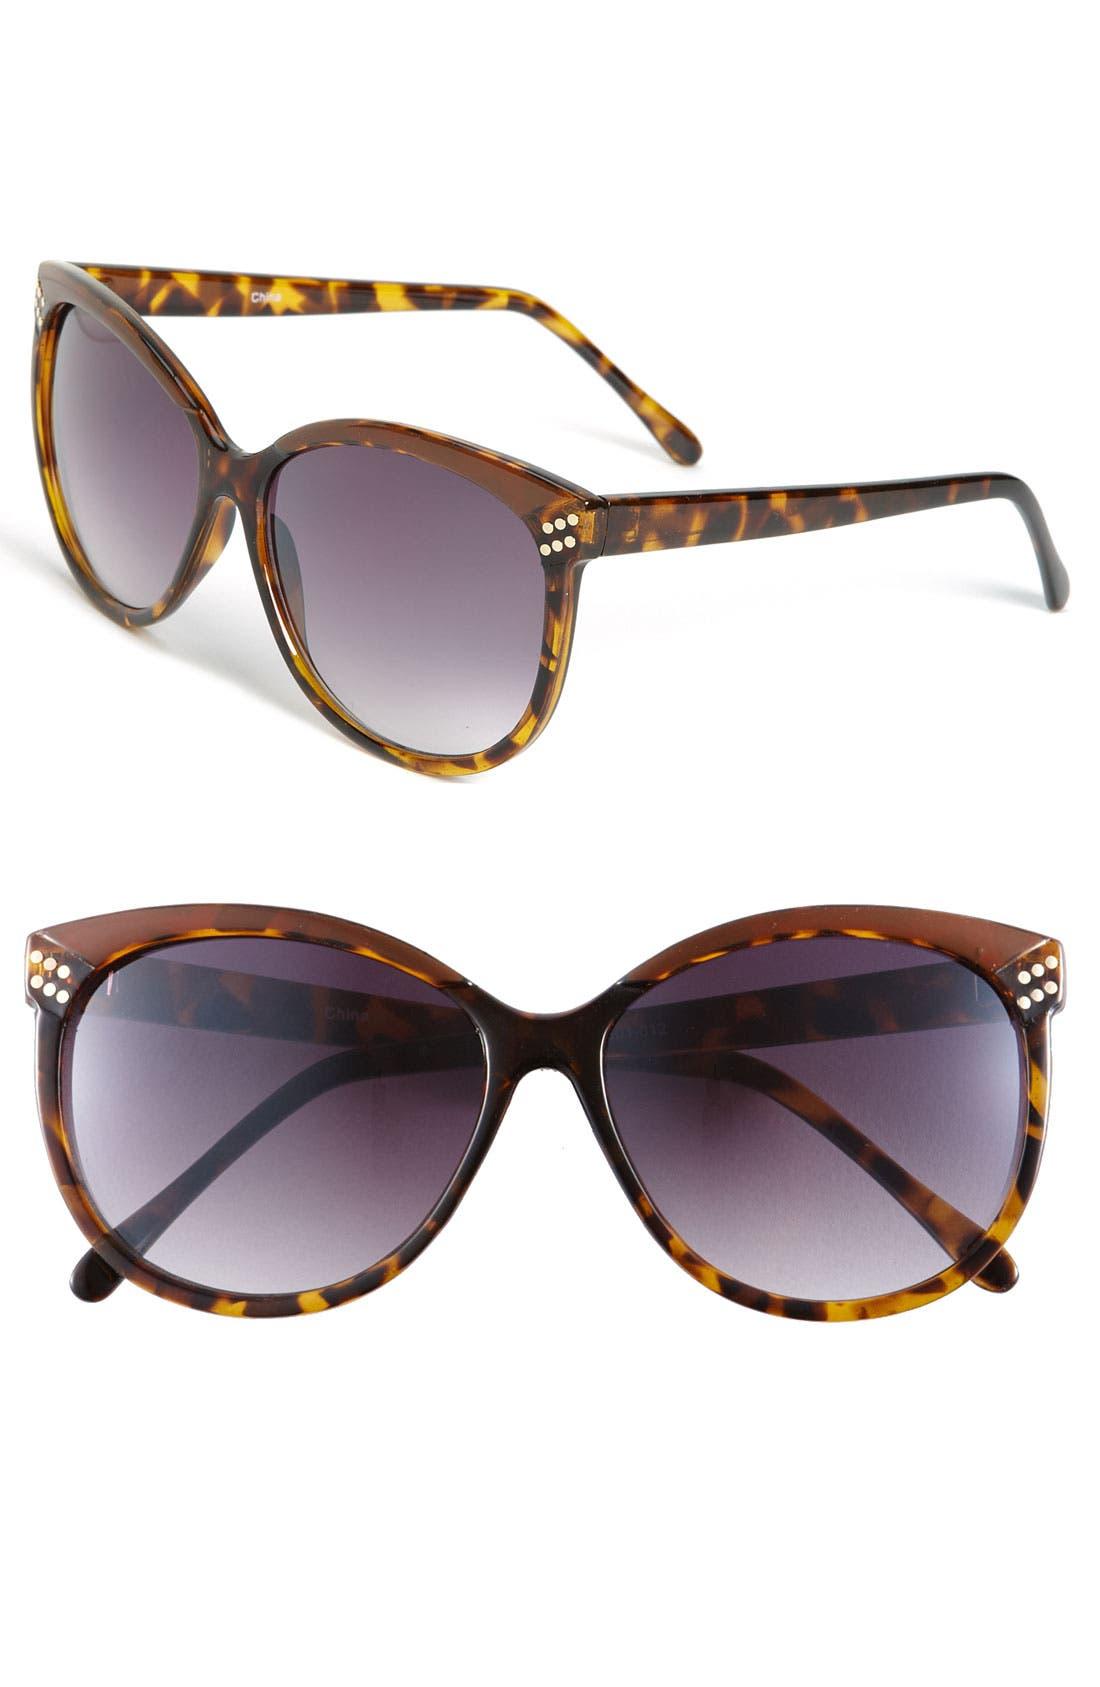 Alternate Image 1 Selected - Icon Eyewear 'Lily' Sunglasses